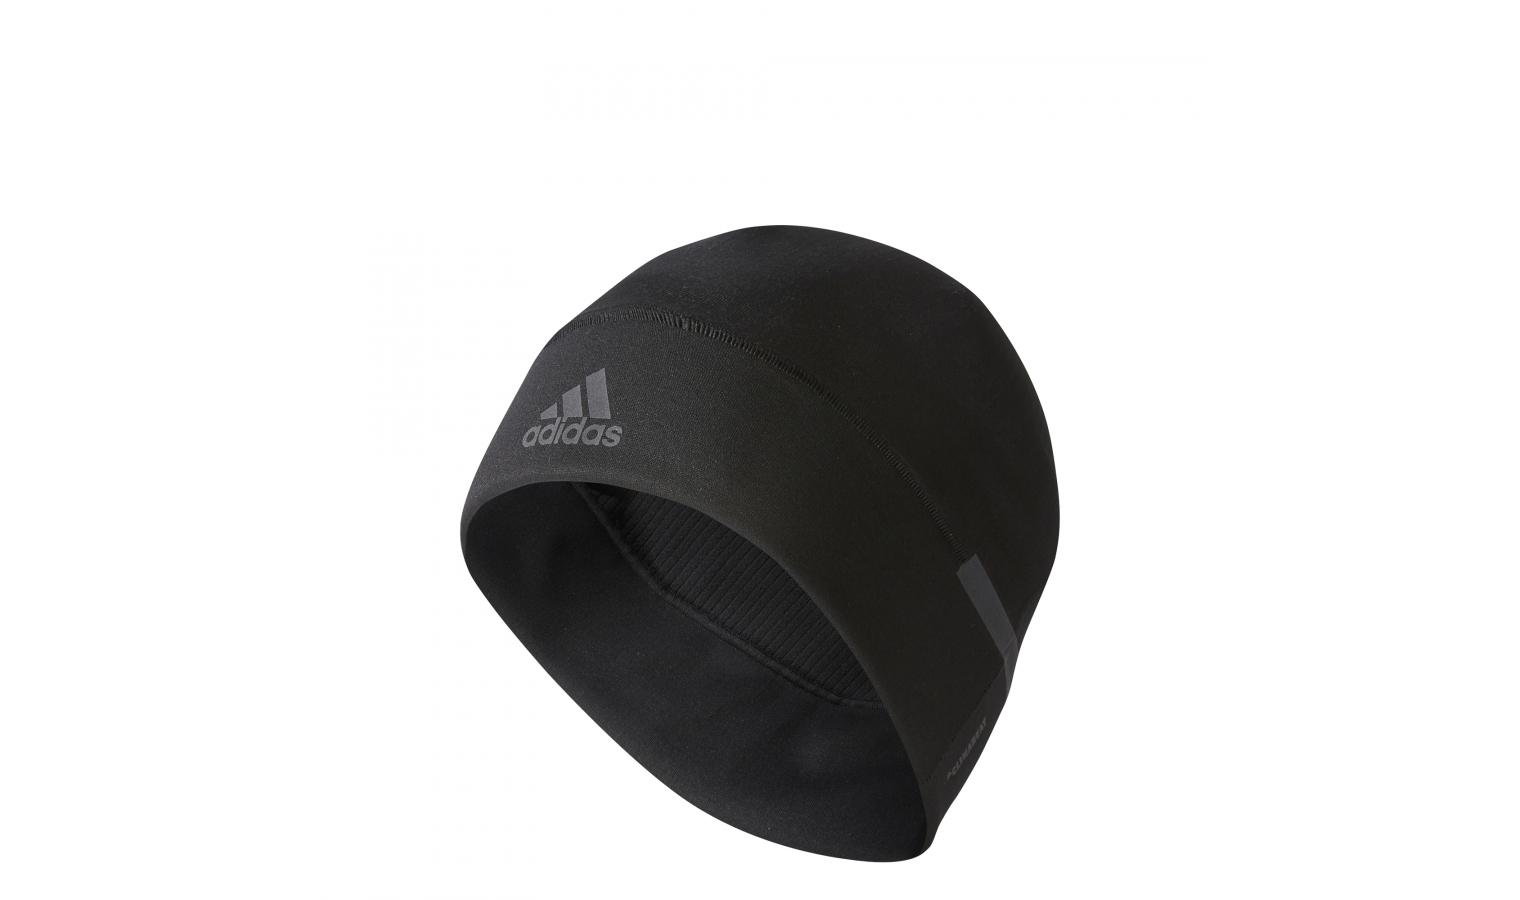 6f05c36e3 Čiapky adidas CLMHT FLC bean čierna | AD Sport.sk